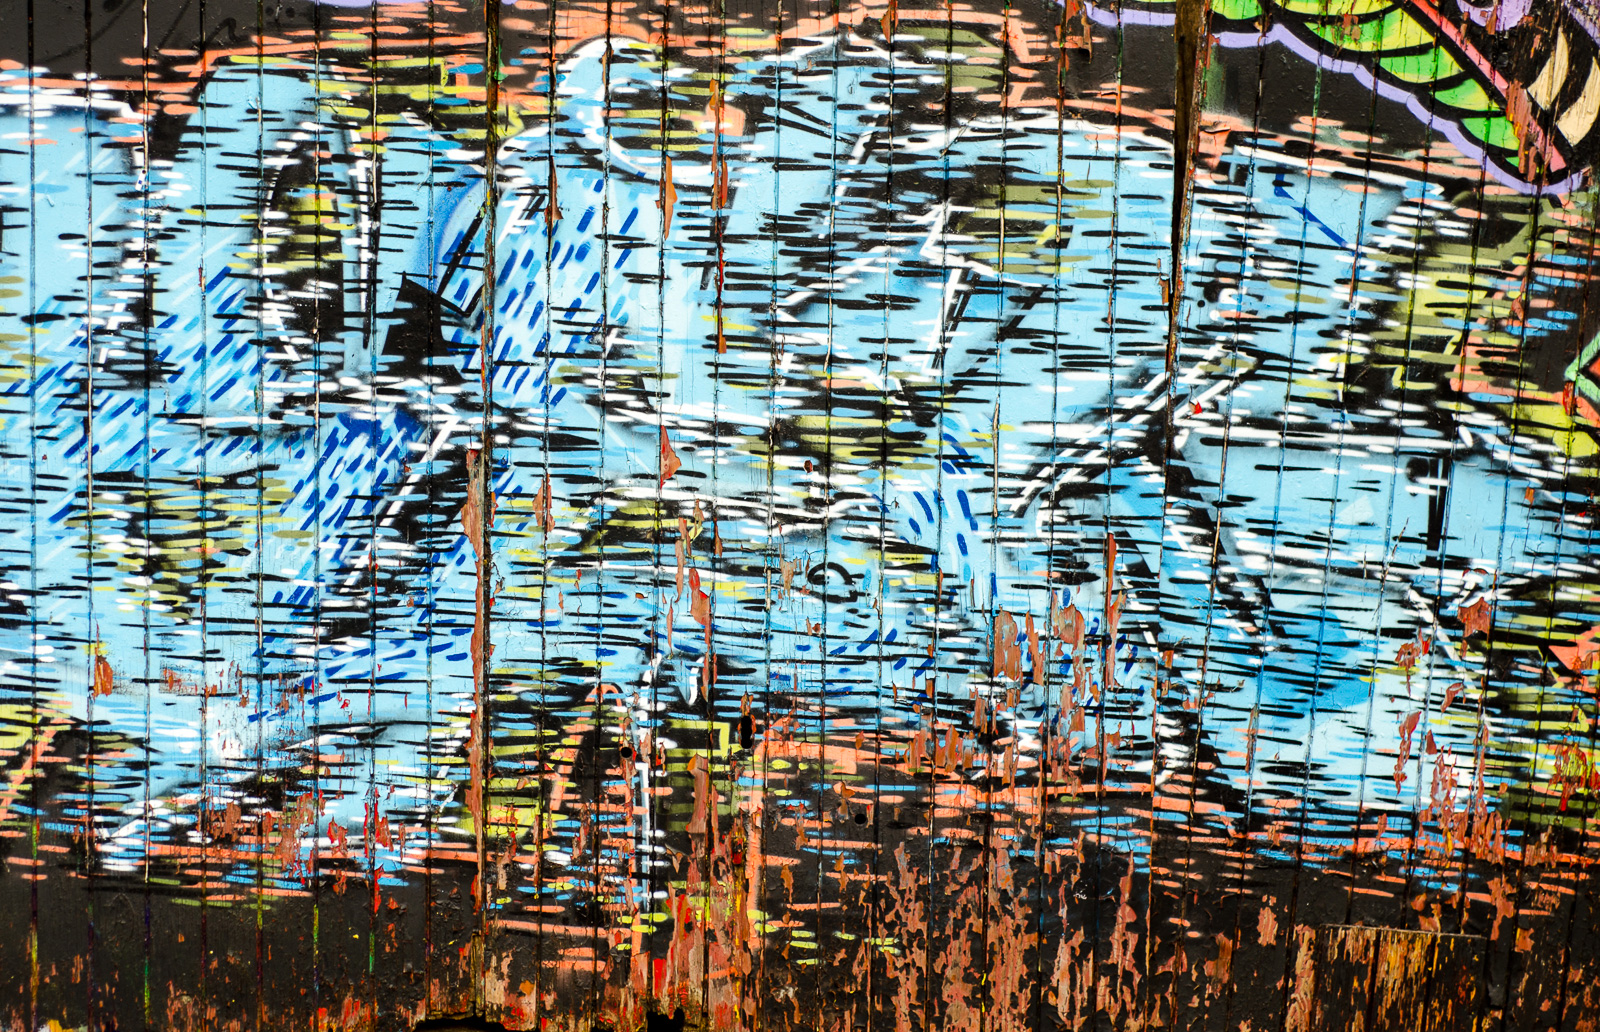 SNAP: Pointillism